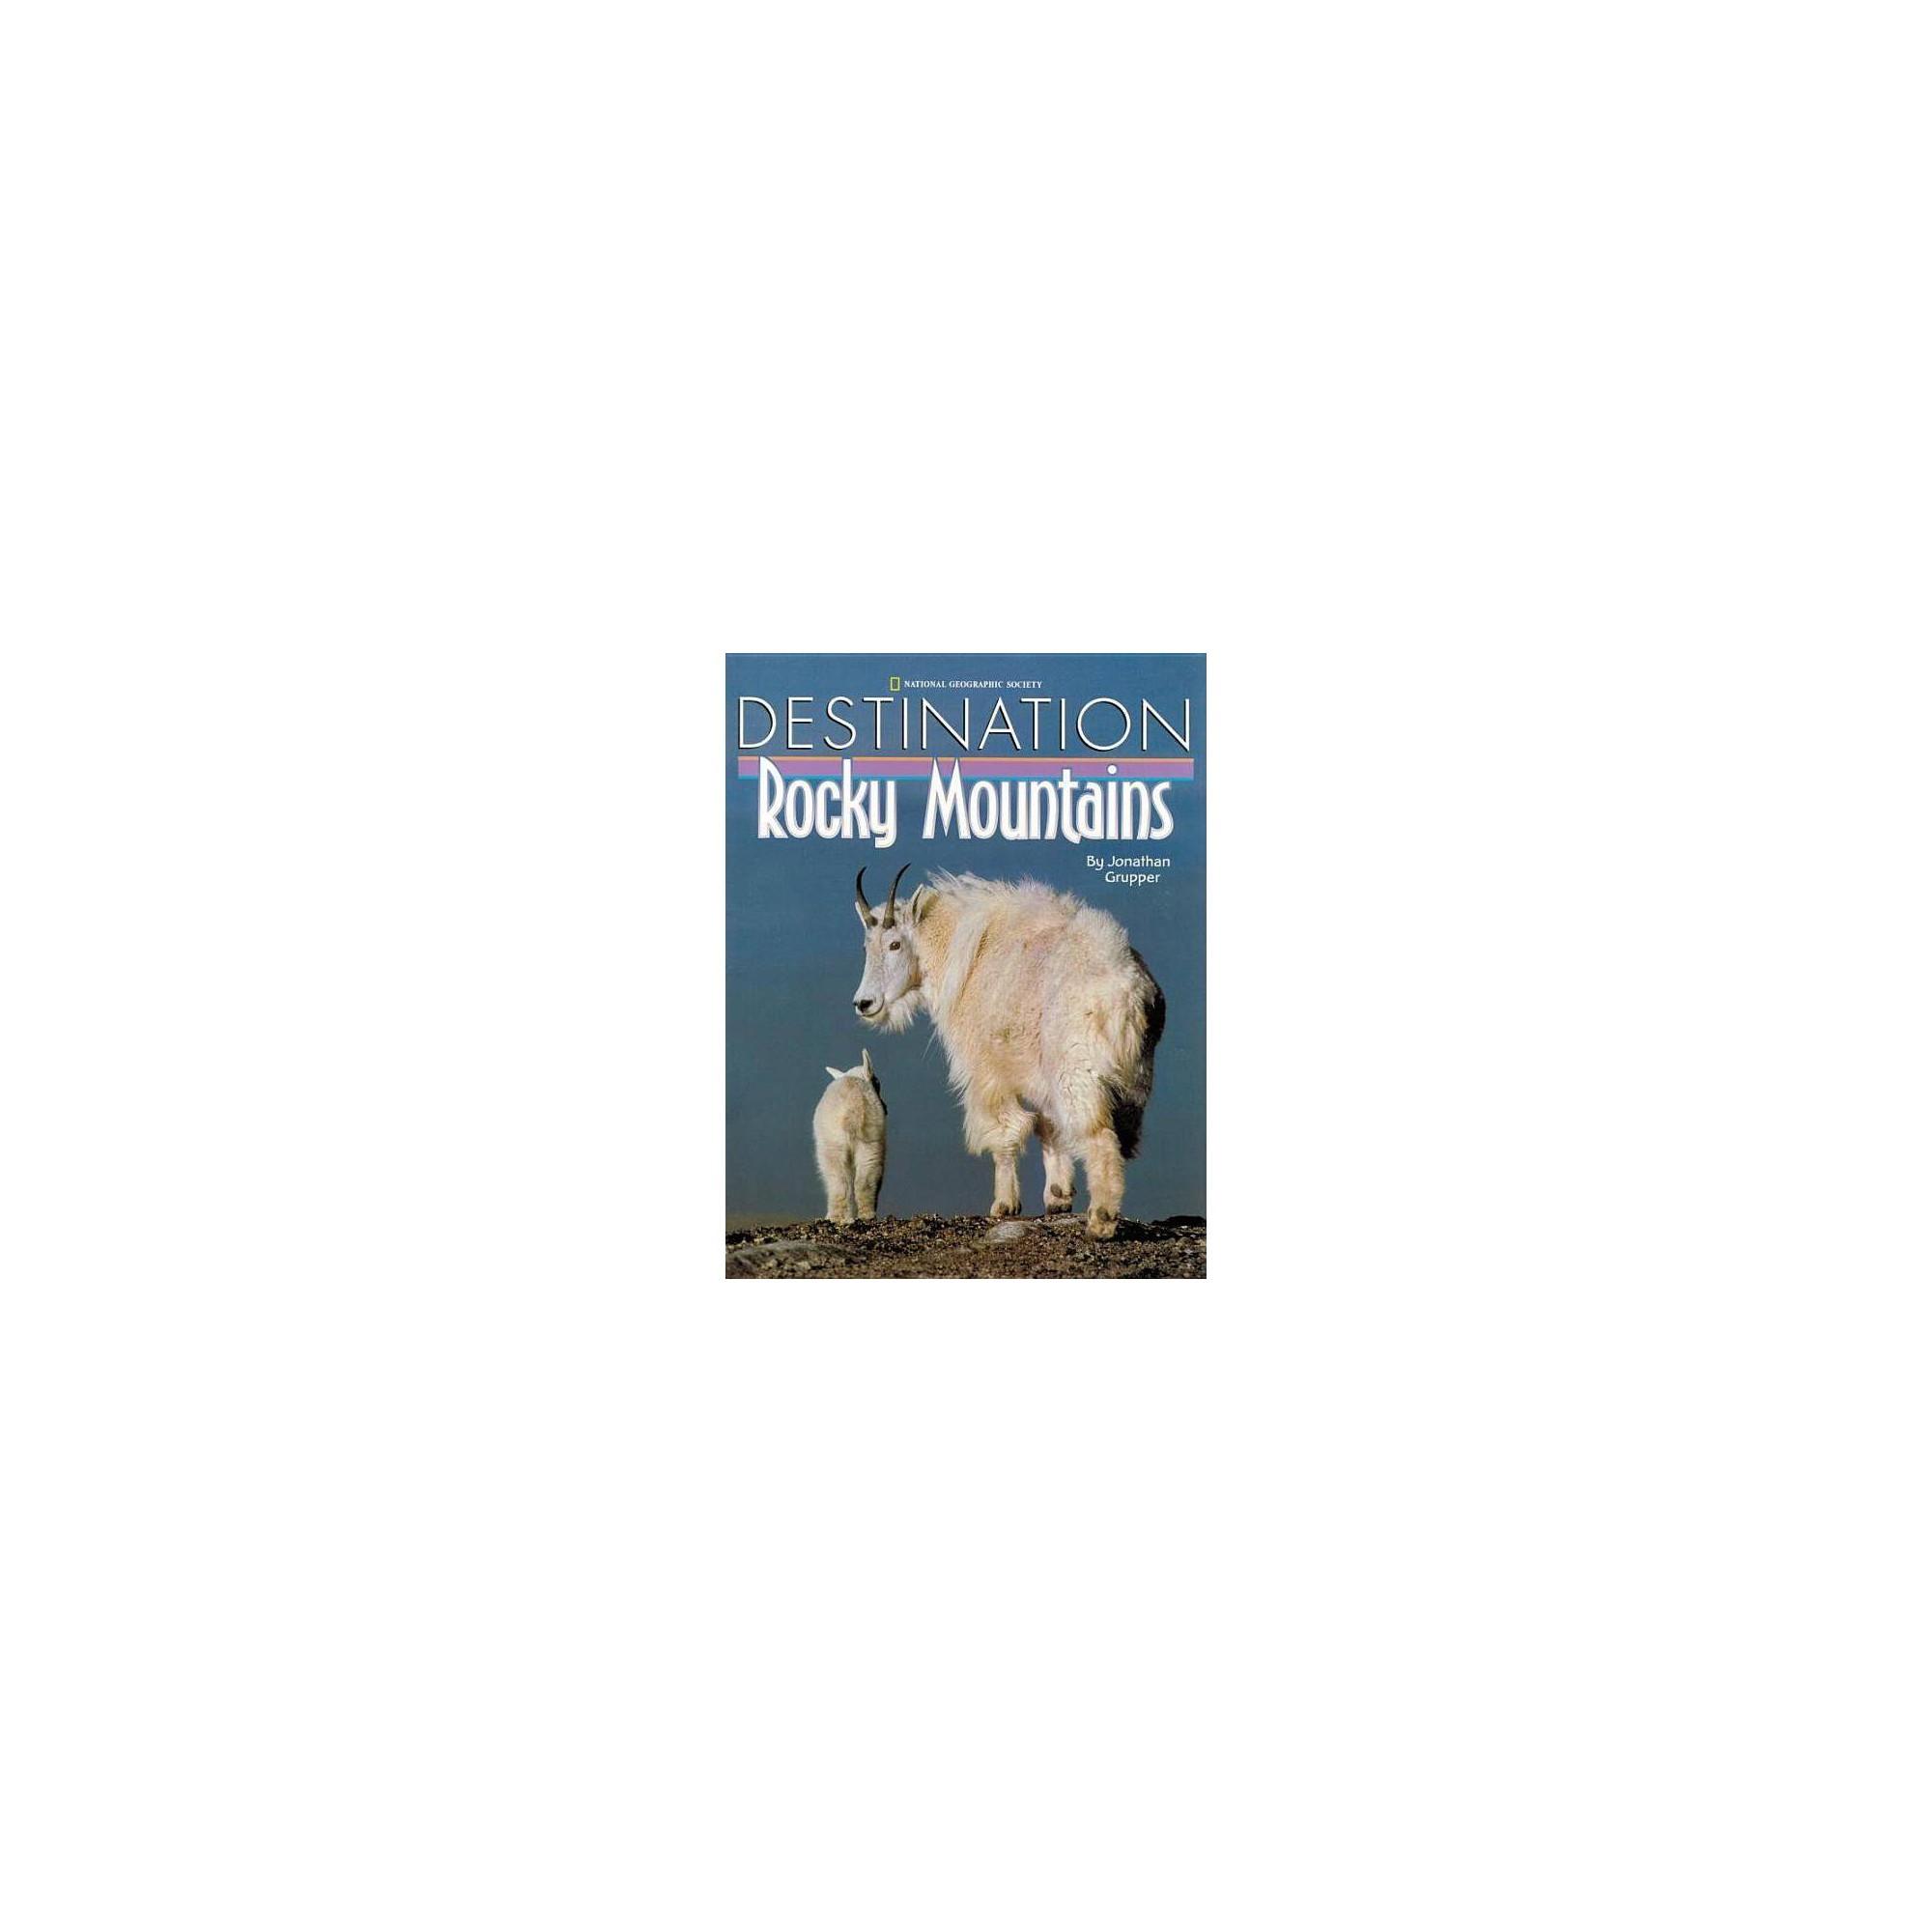 Destination: Rocky Mountains - (Destination (Hardcover)) by Jonathan Grupper (Hardcover)